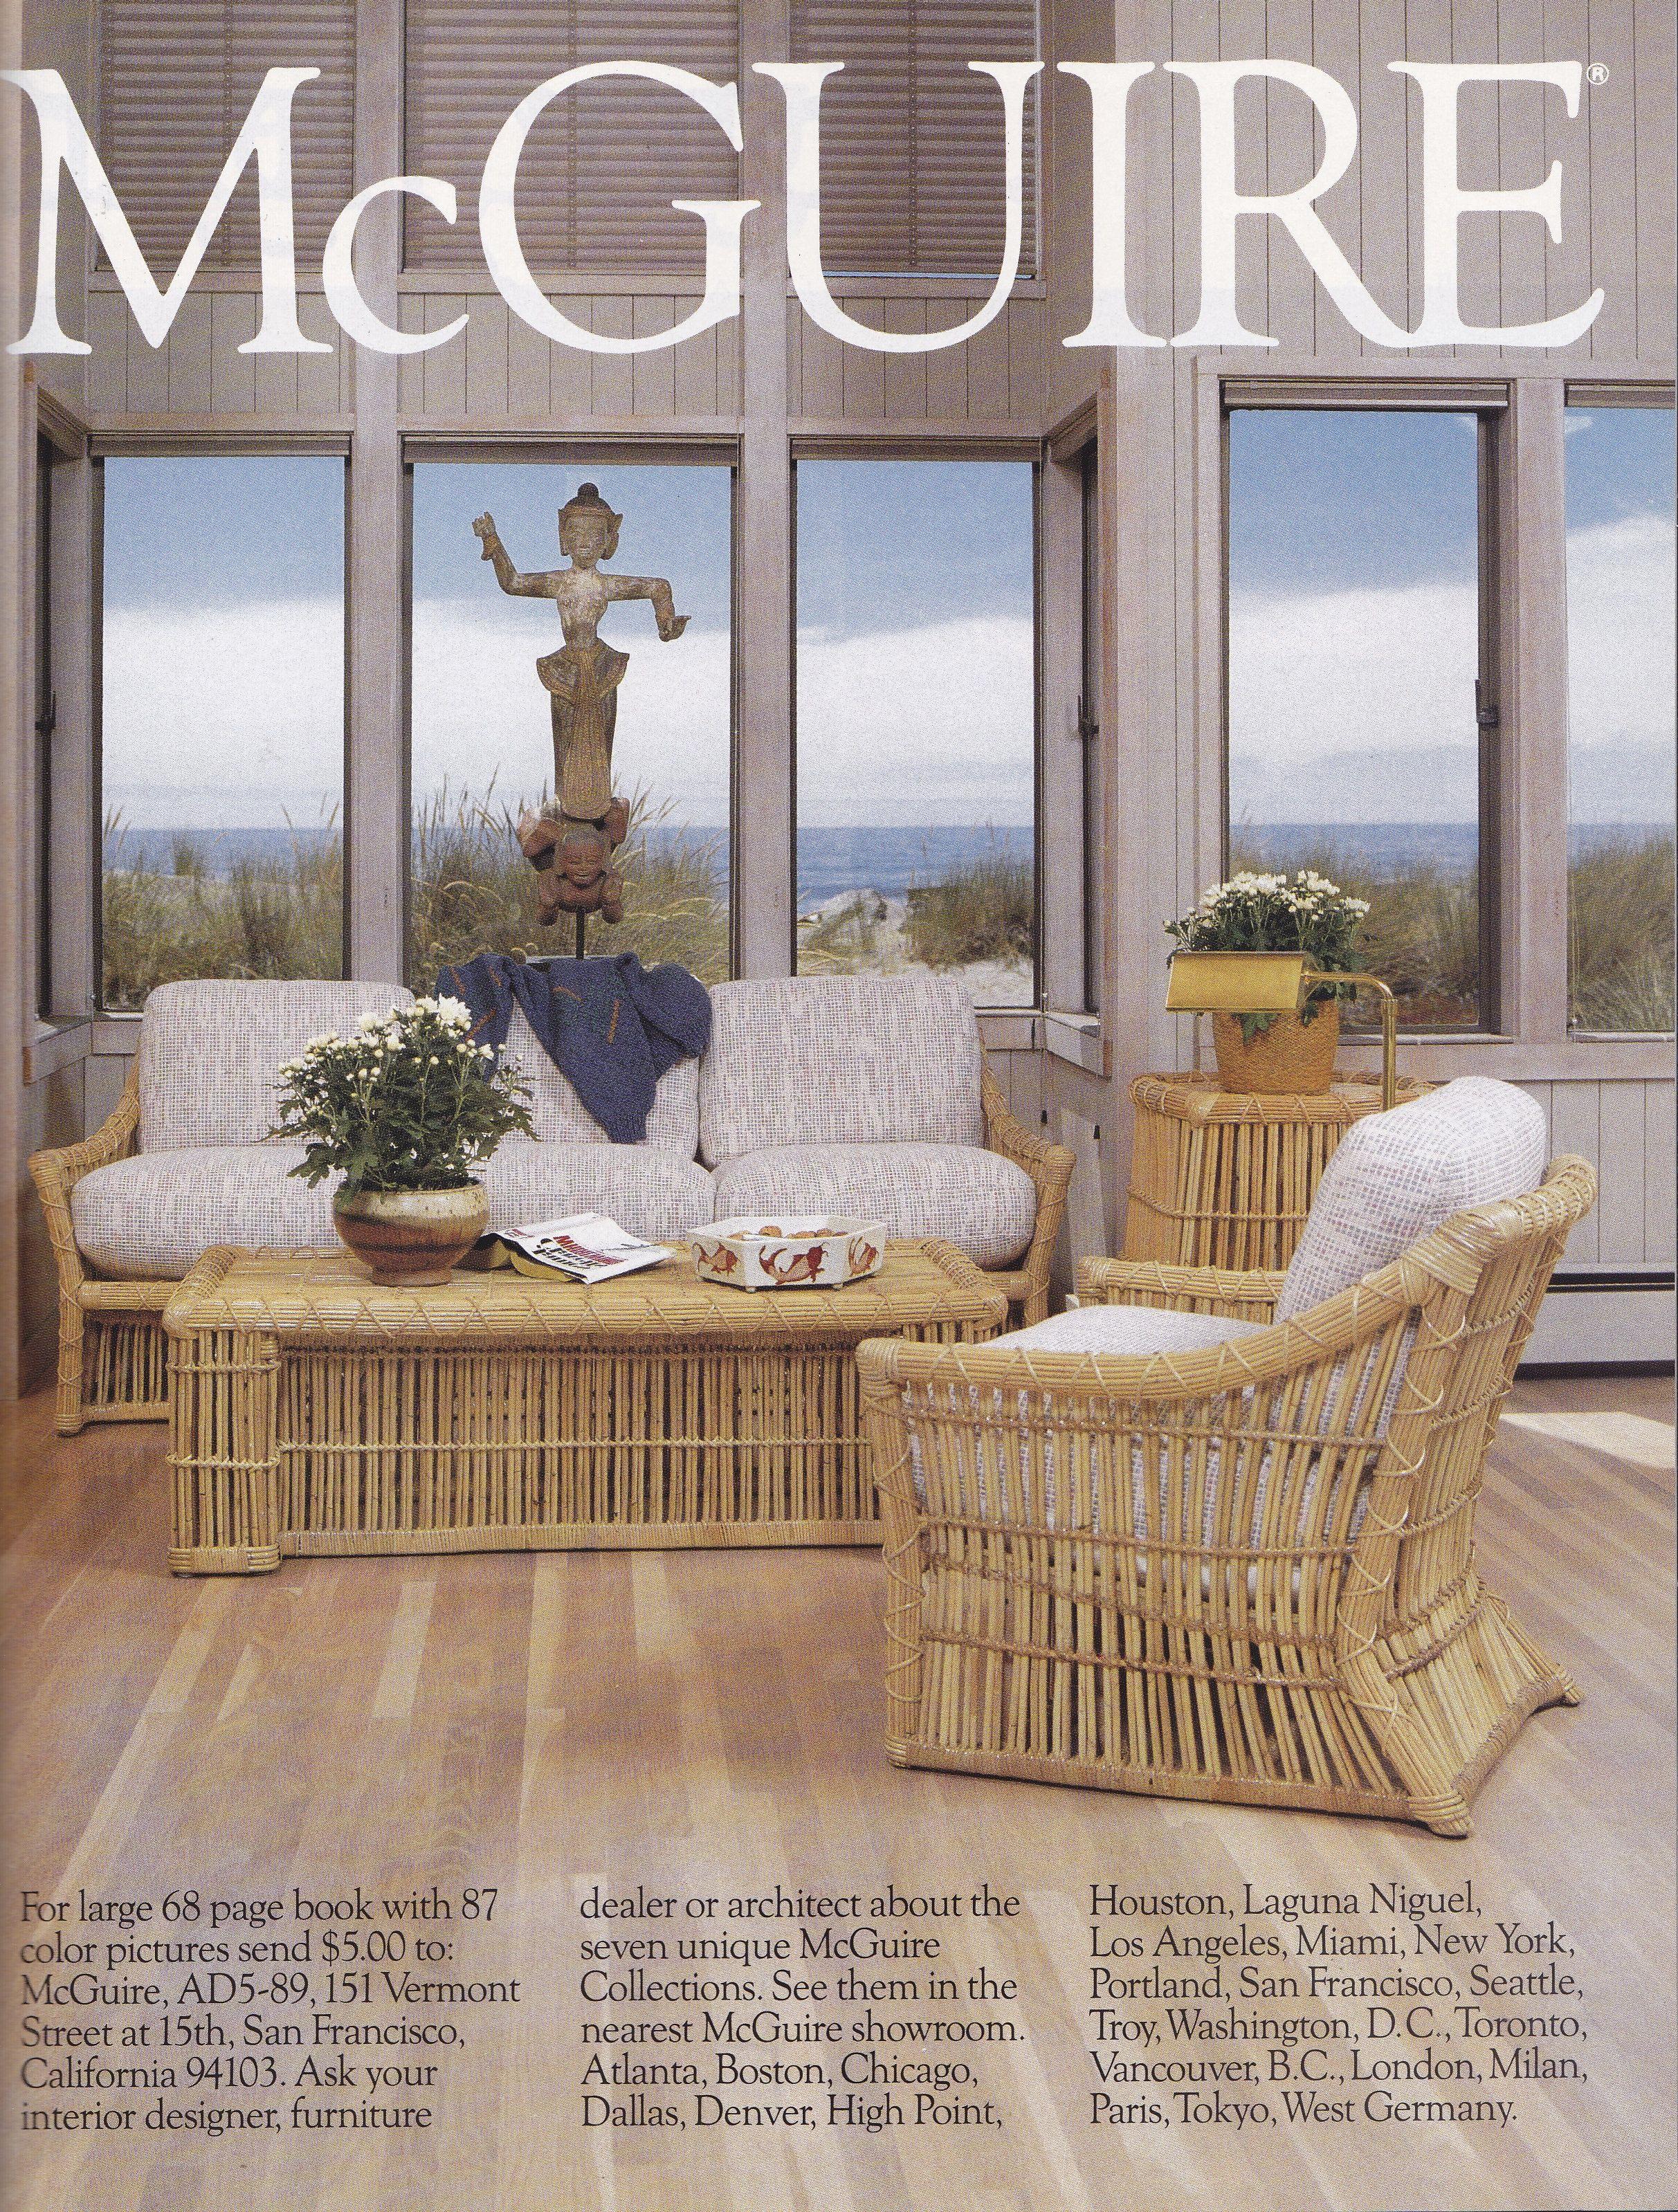 McGuire Furniture AD 1992, Stinson Beach.